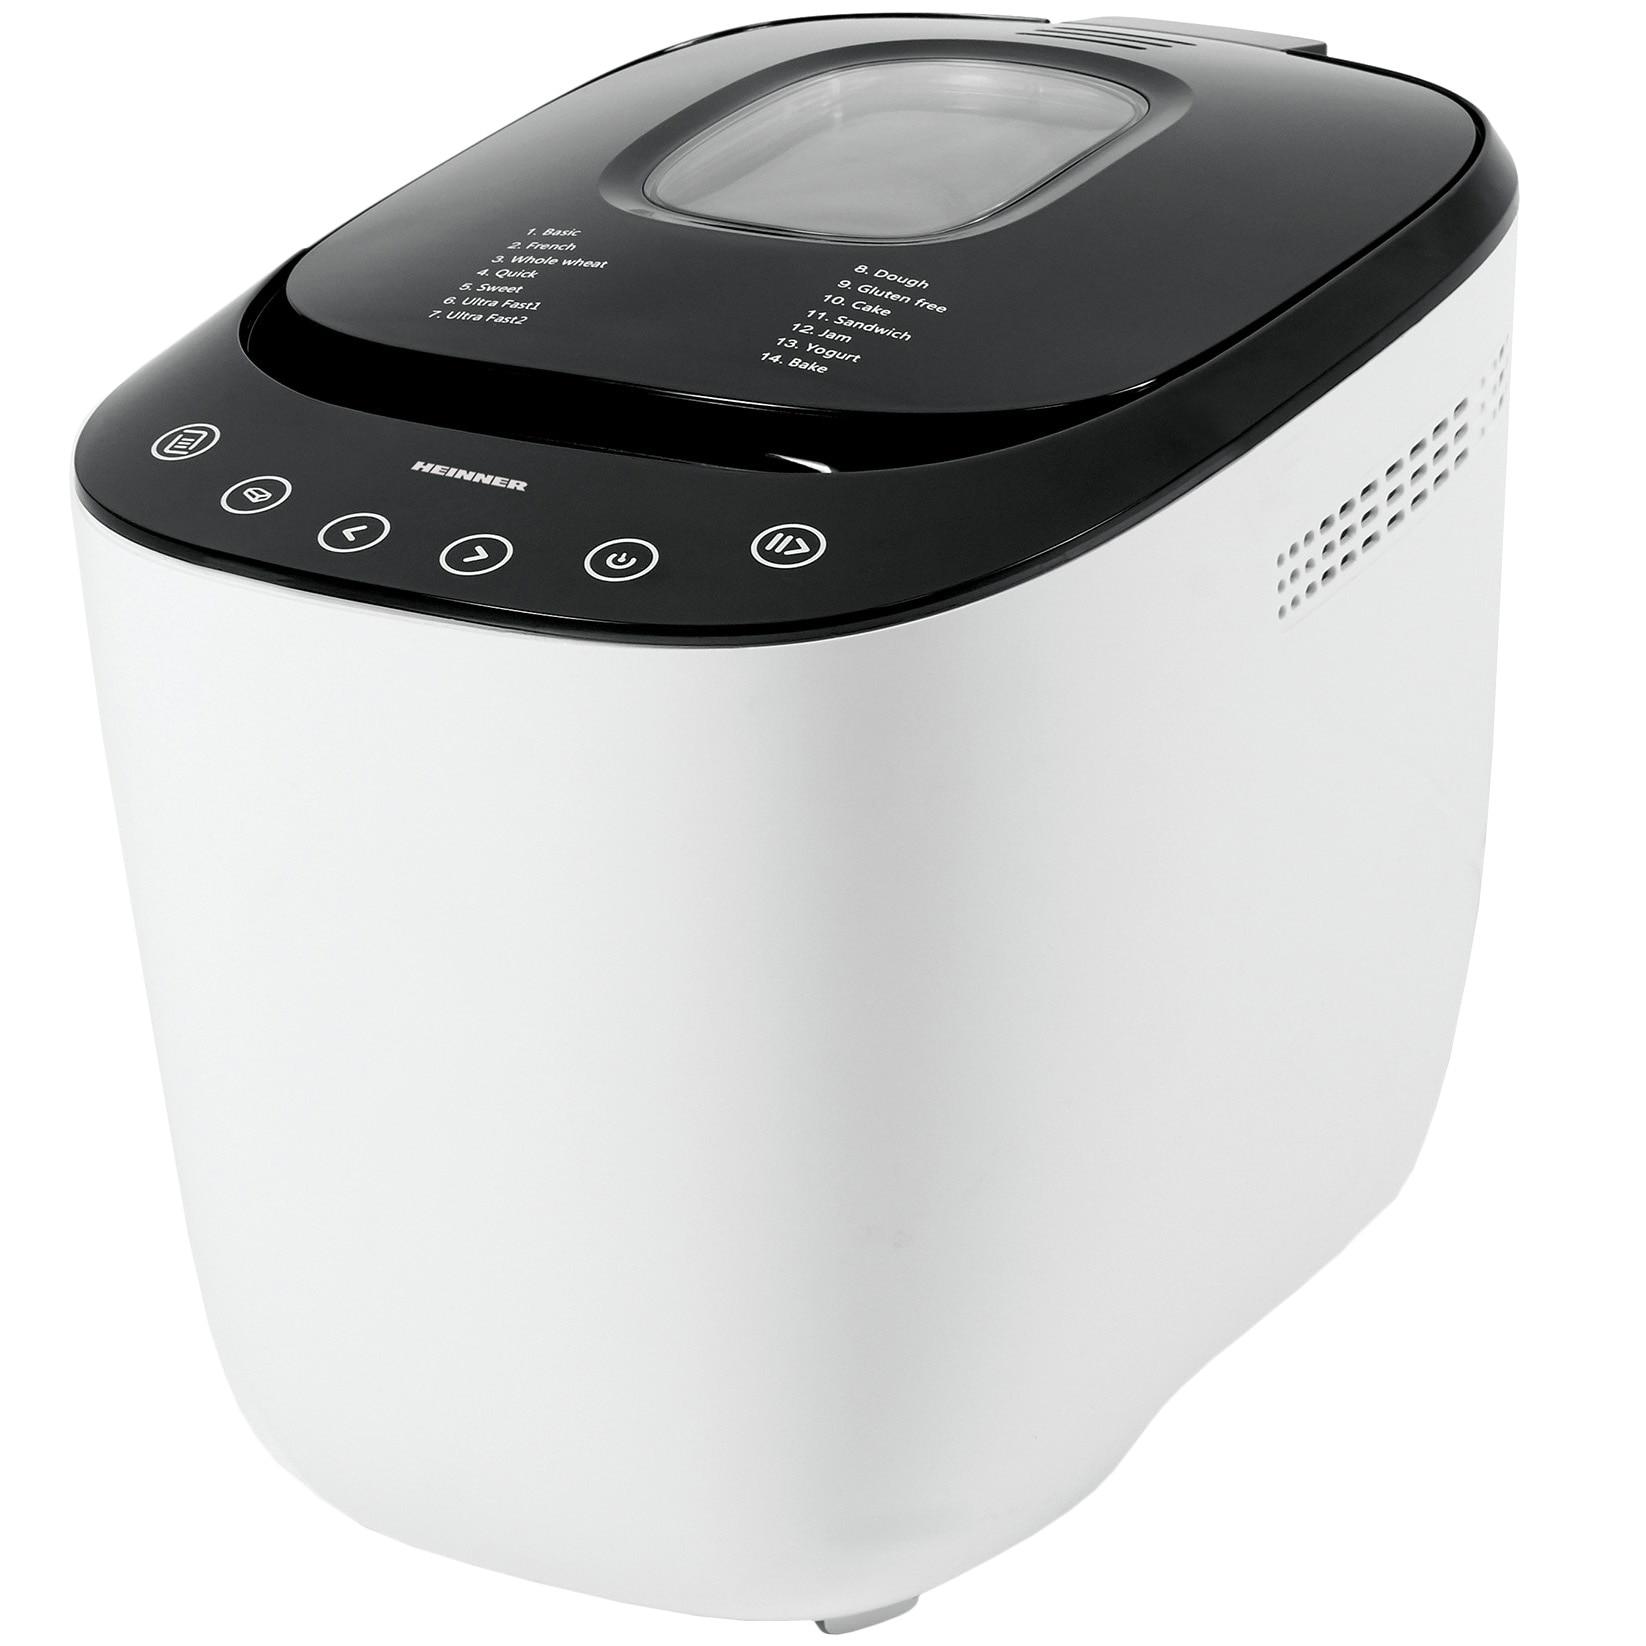 Fotografie Masina de paine Heinner HBM-900WHBK, 550W, Capacitate 750-900G, Touch Control, Timer, Afisaj LCD, Alb